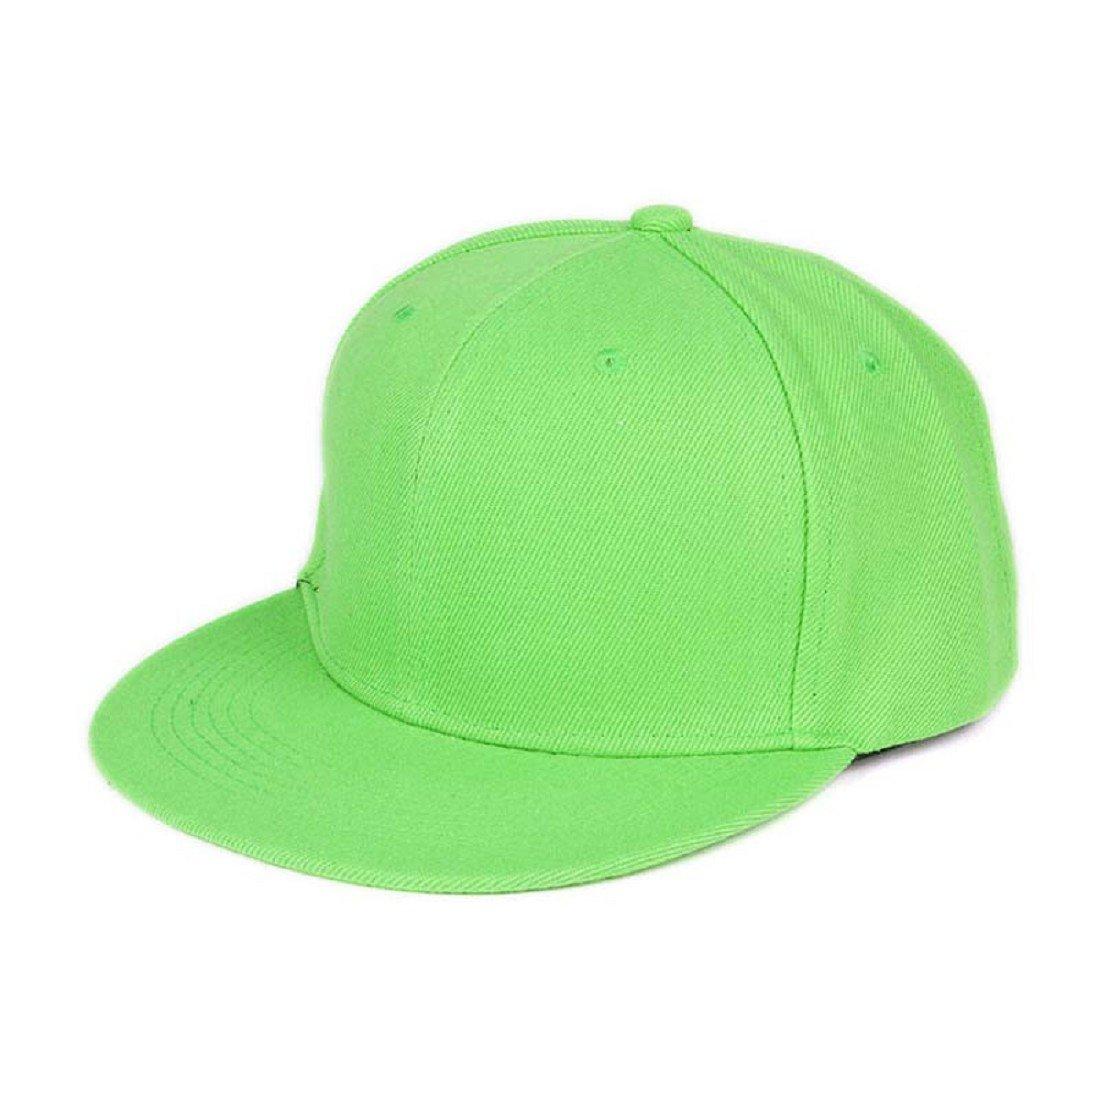 8e151b2ca8140 Tongshi Moda Unisex Plain Snapback Hats Hip-Hop ajustable Gorra de béisbol  (Verde)  Amazon.es  Coche y moto